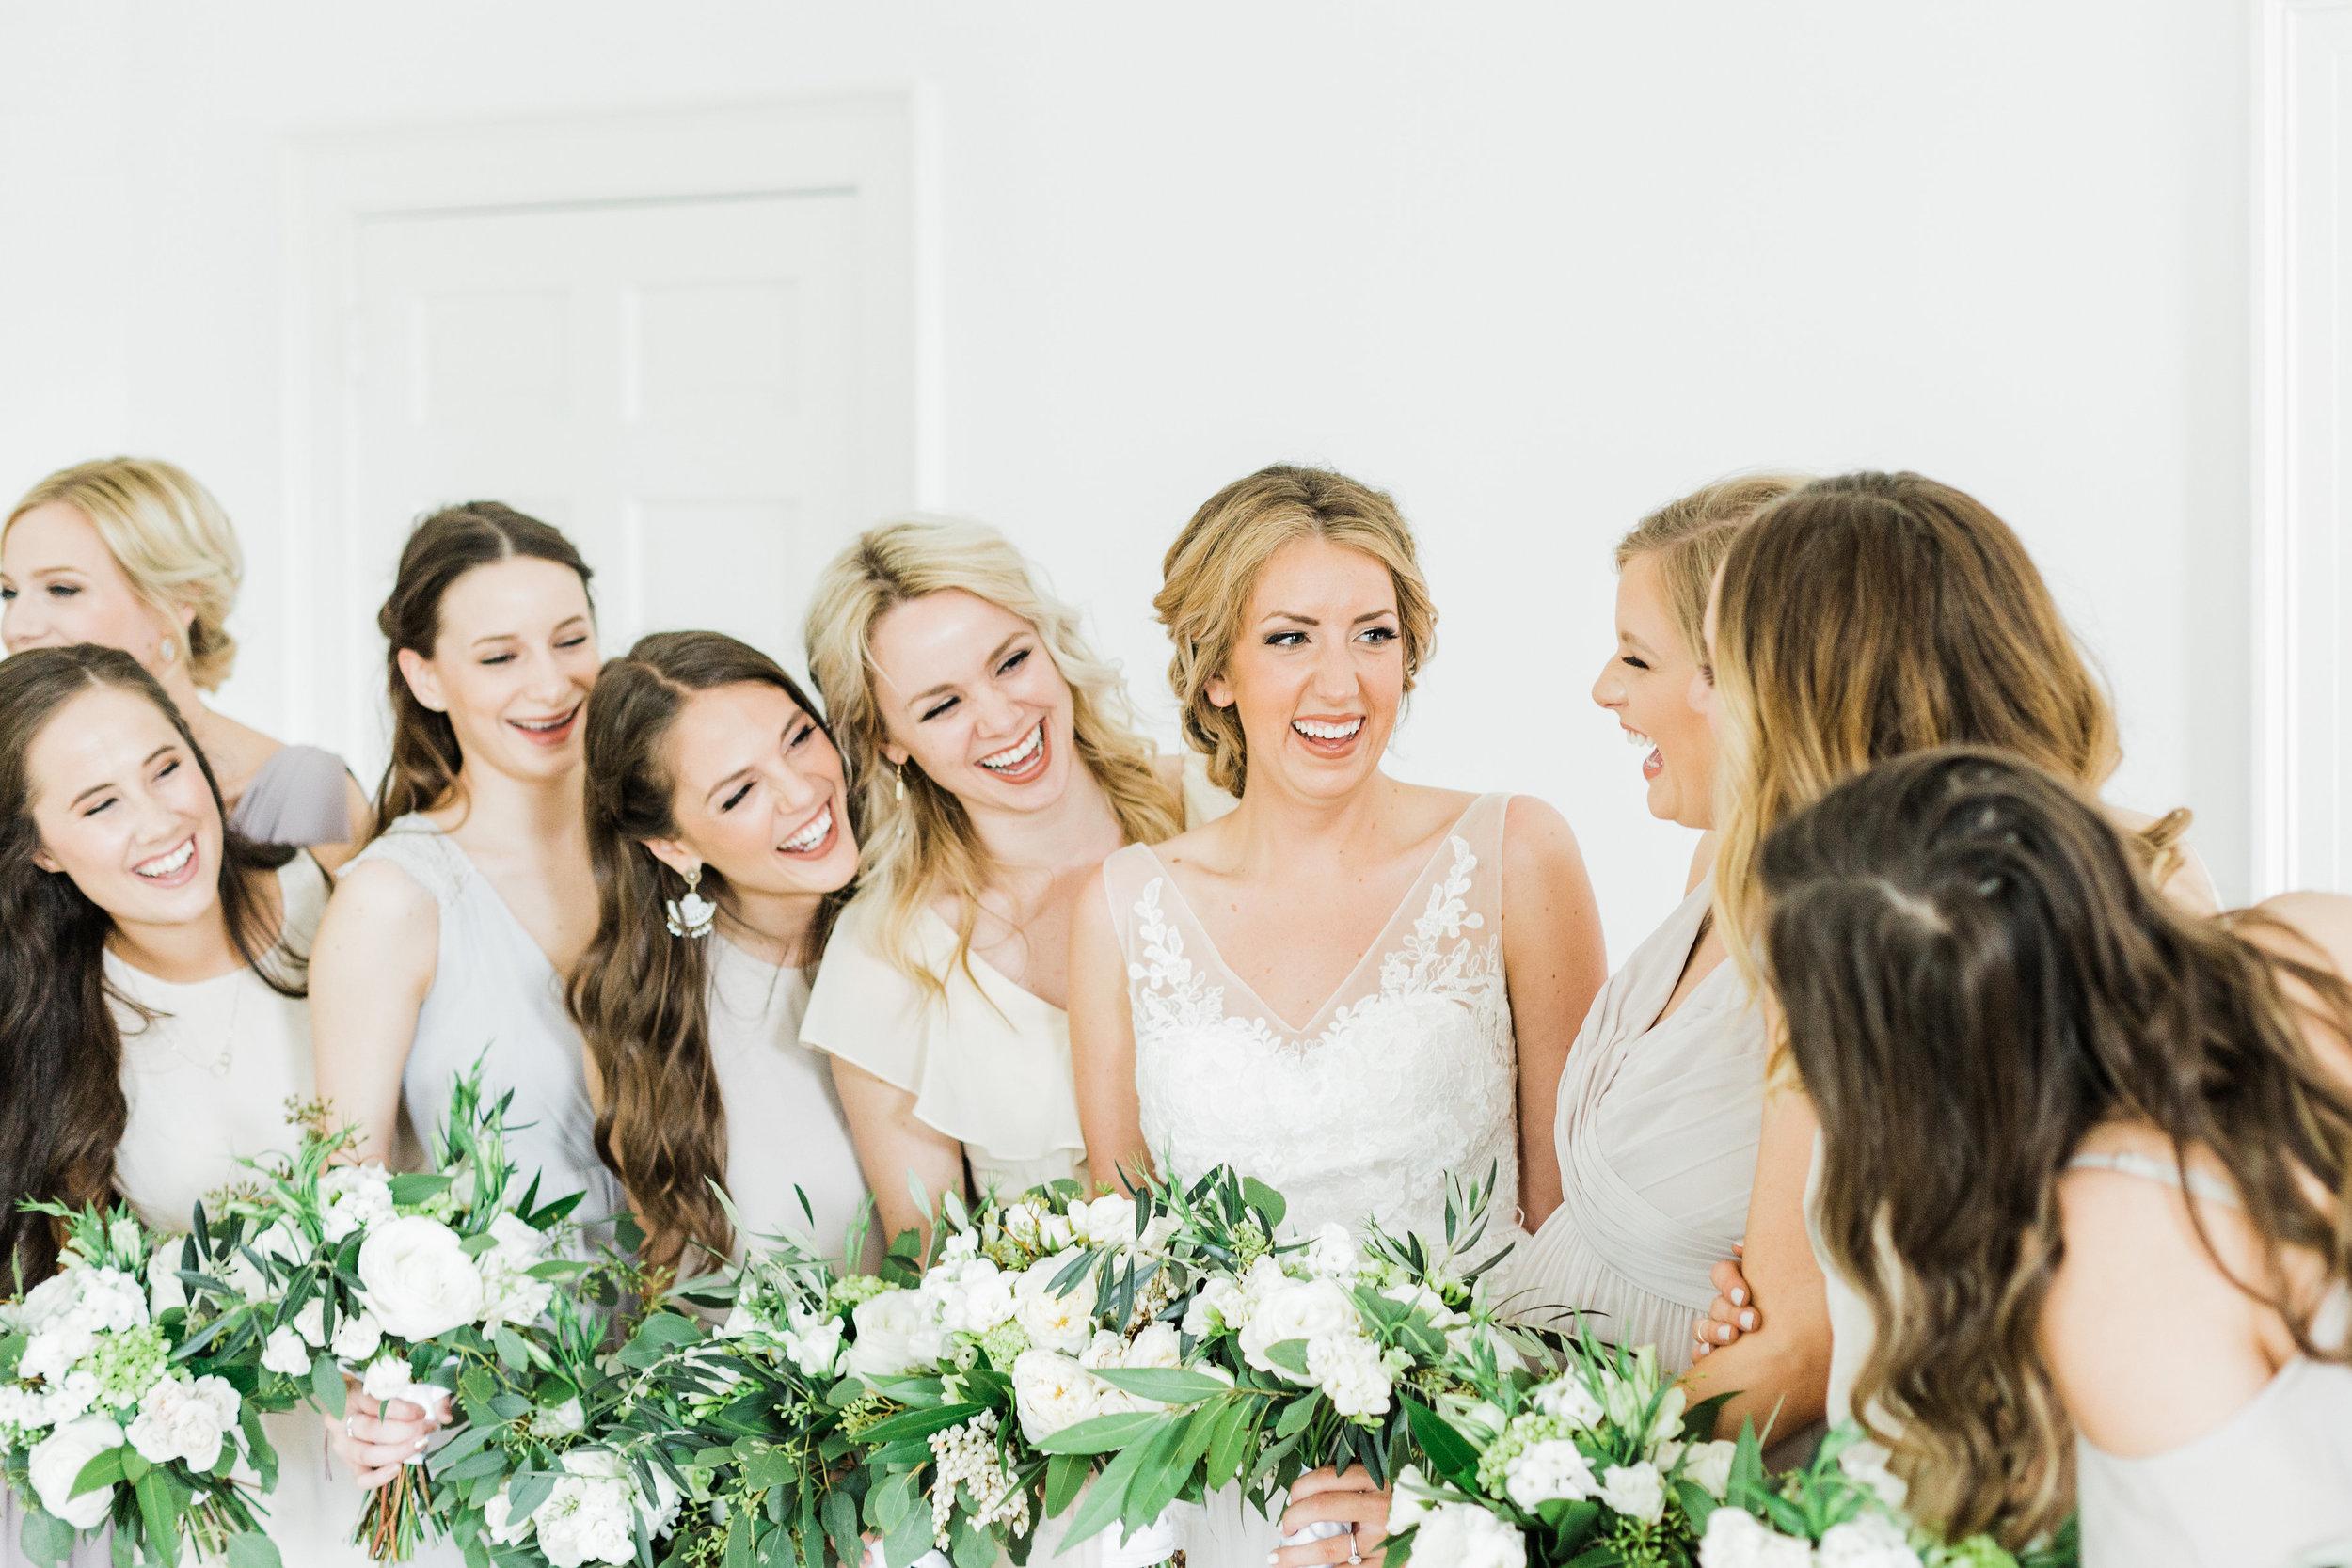 Southern Fete, Southern Wedding, Bride and Bridesmaid, Carolynn Seibert Photography